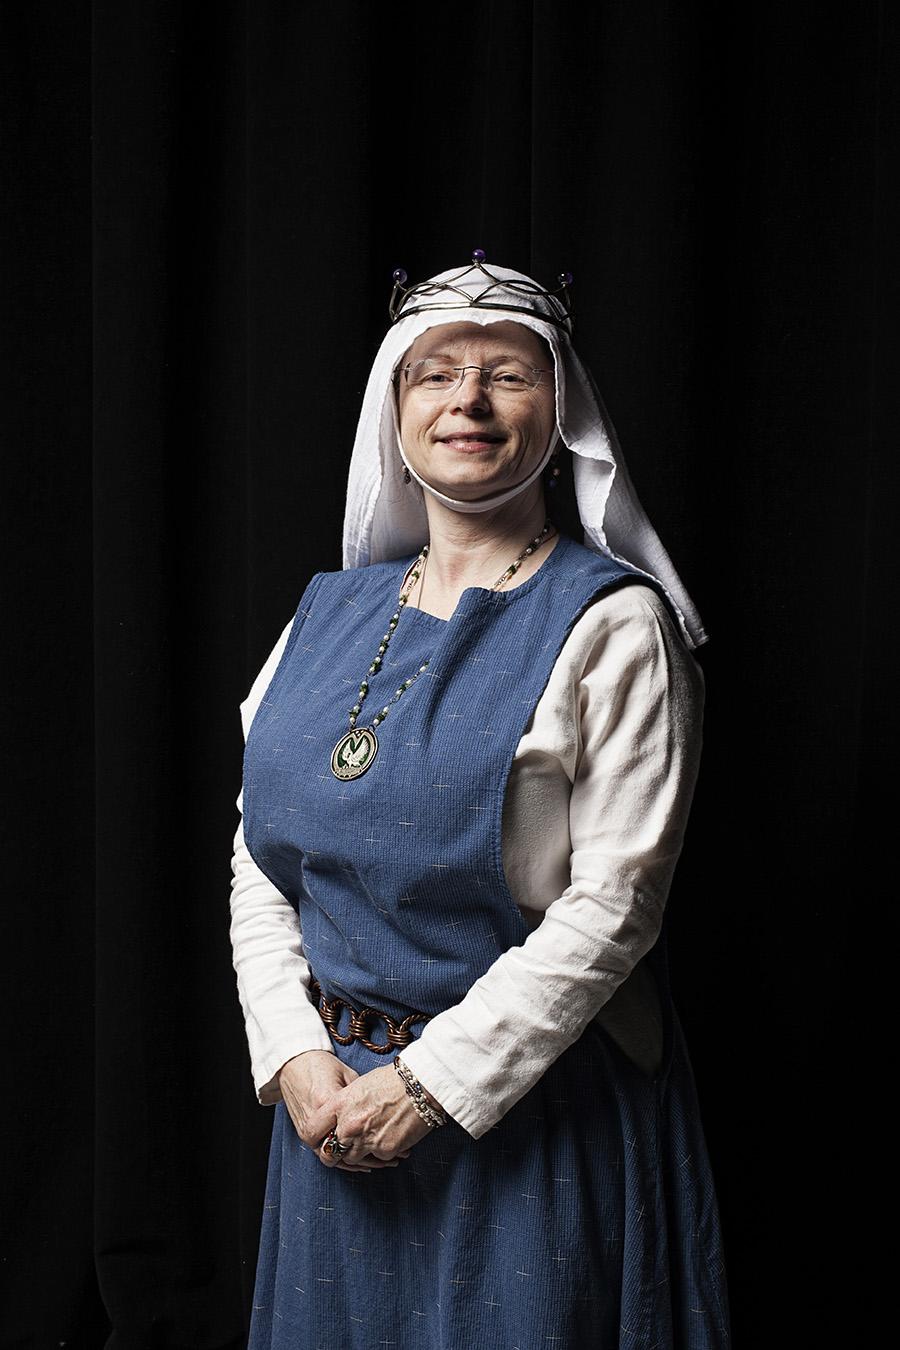 Medieval Portrait | Gulf Coast Society for Creative Anachronism